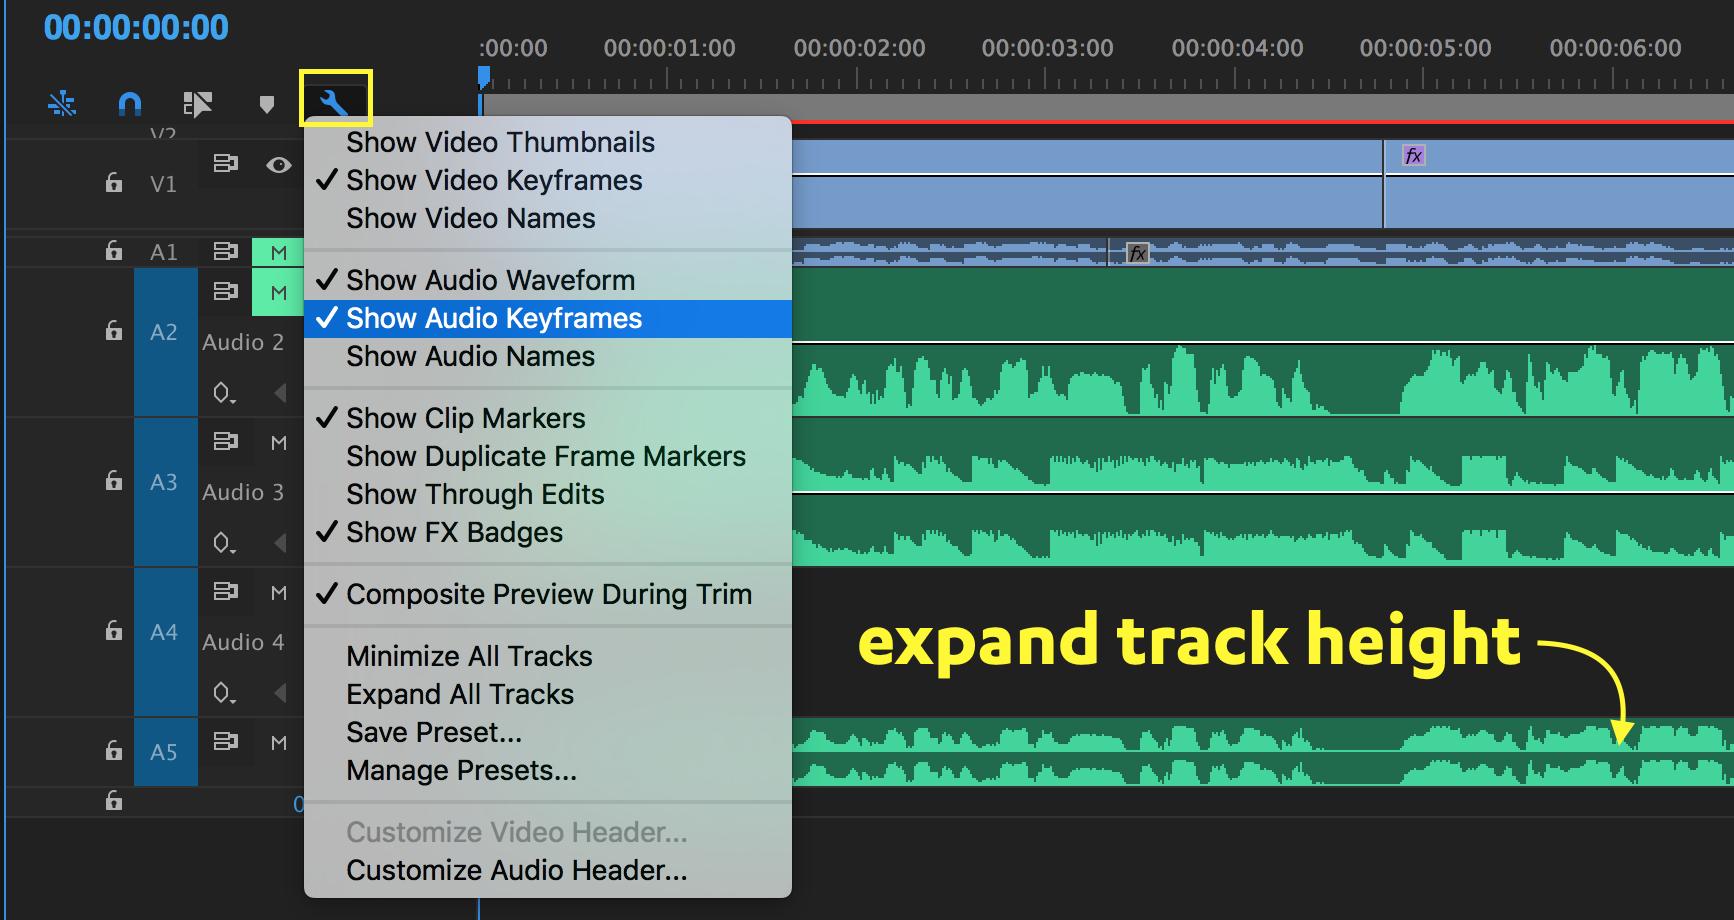 show-audio-keyframes-timeline-premiere-pro